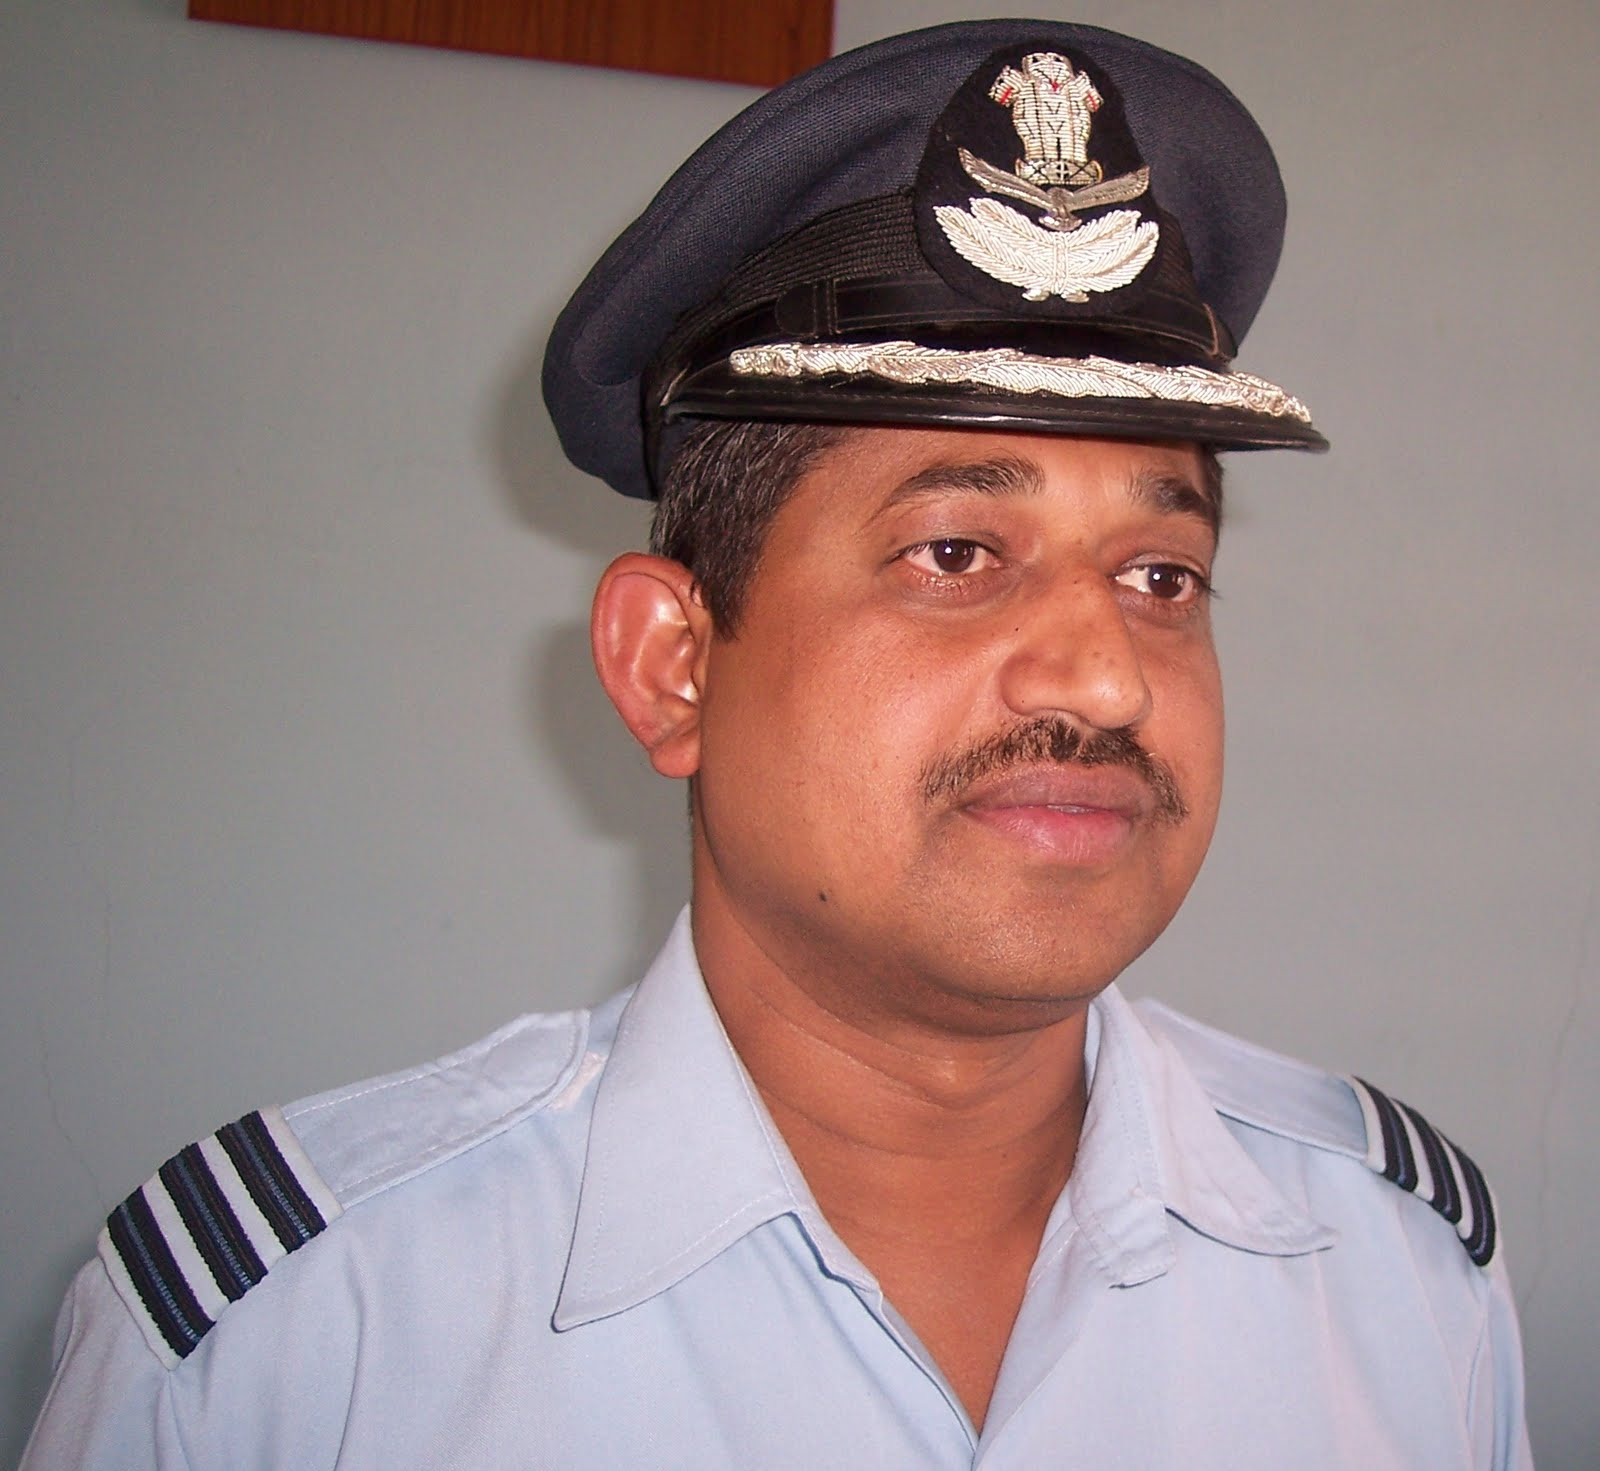 Wd Cdr RK Prasad Head Master